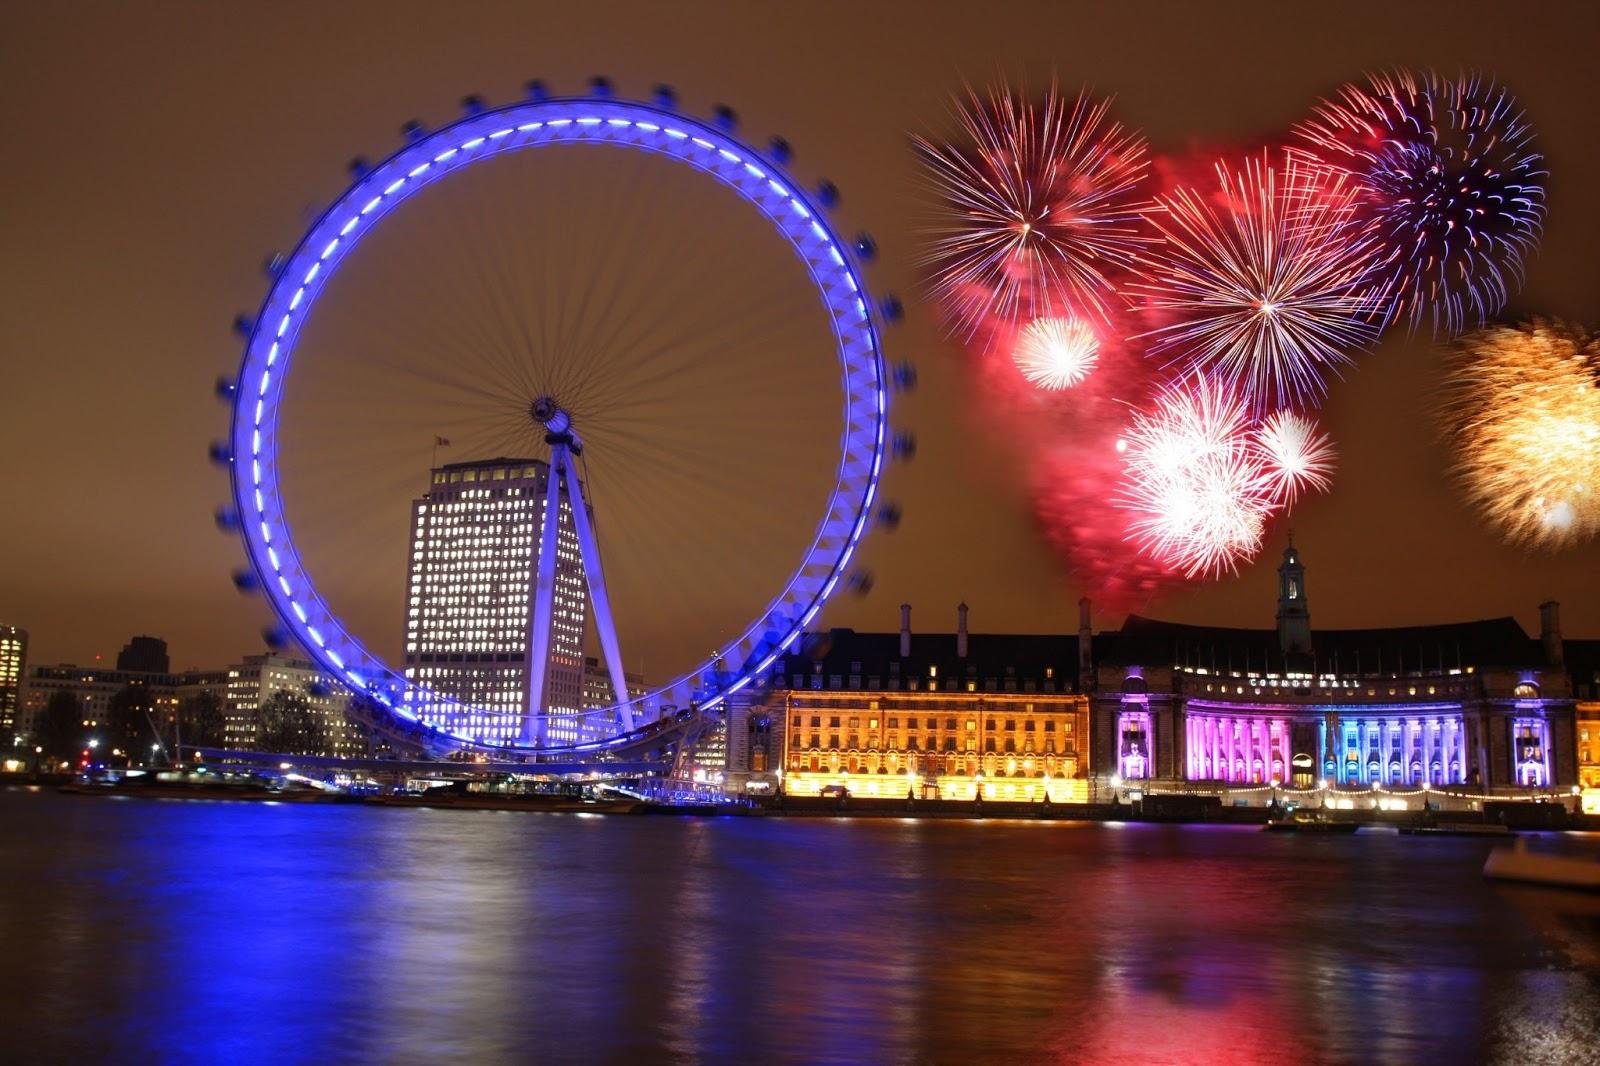 london high resolution - photo #22